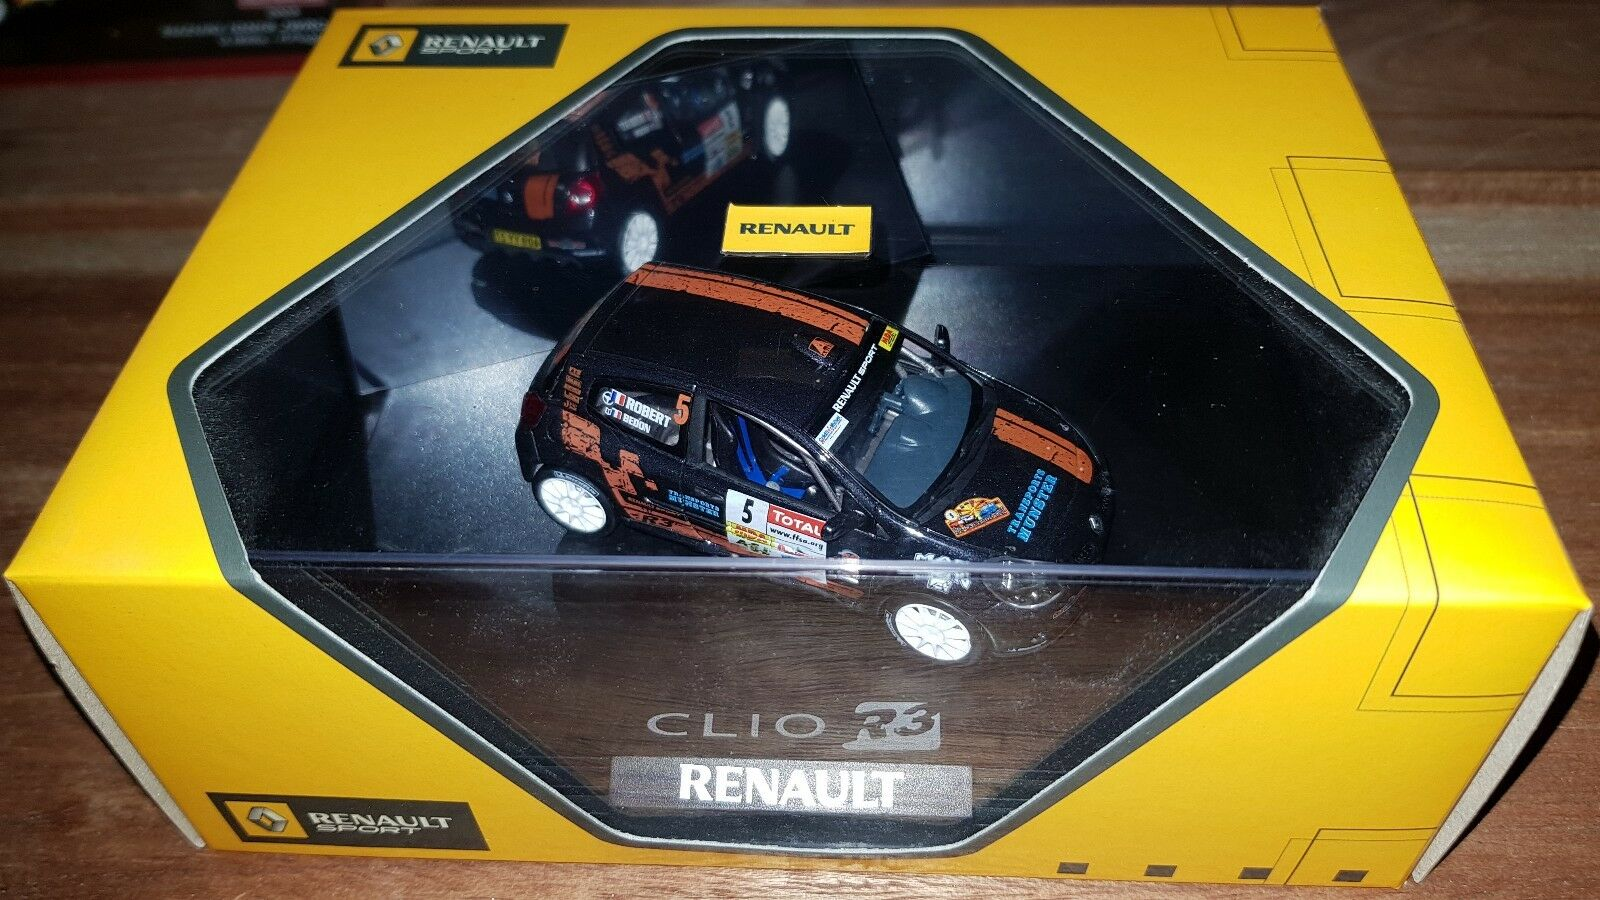 Norev  1 43 Renault Clio R3 7711423242  wholesape pas cher